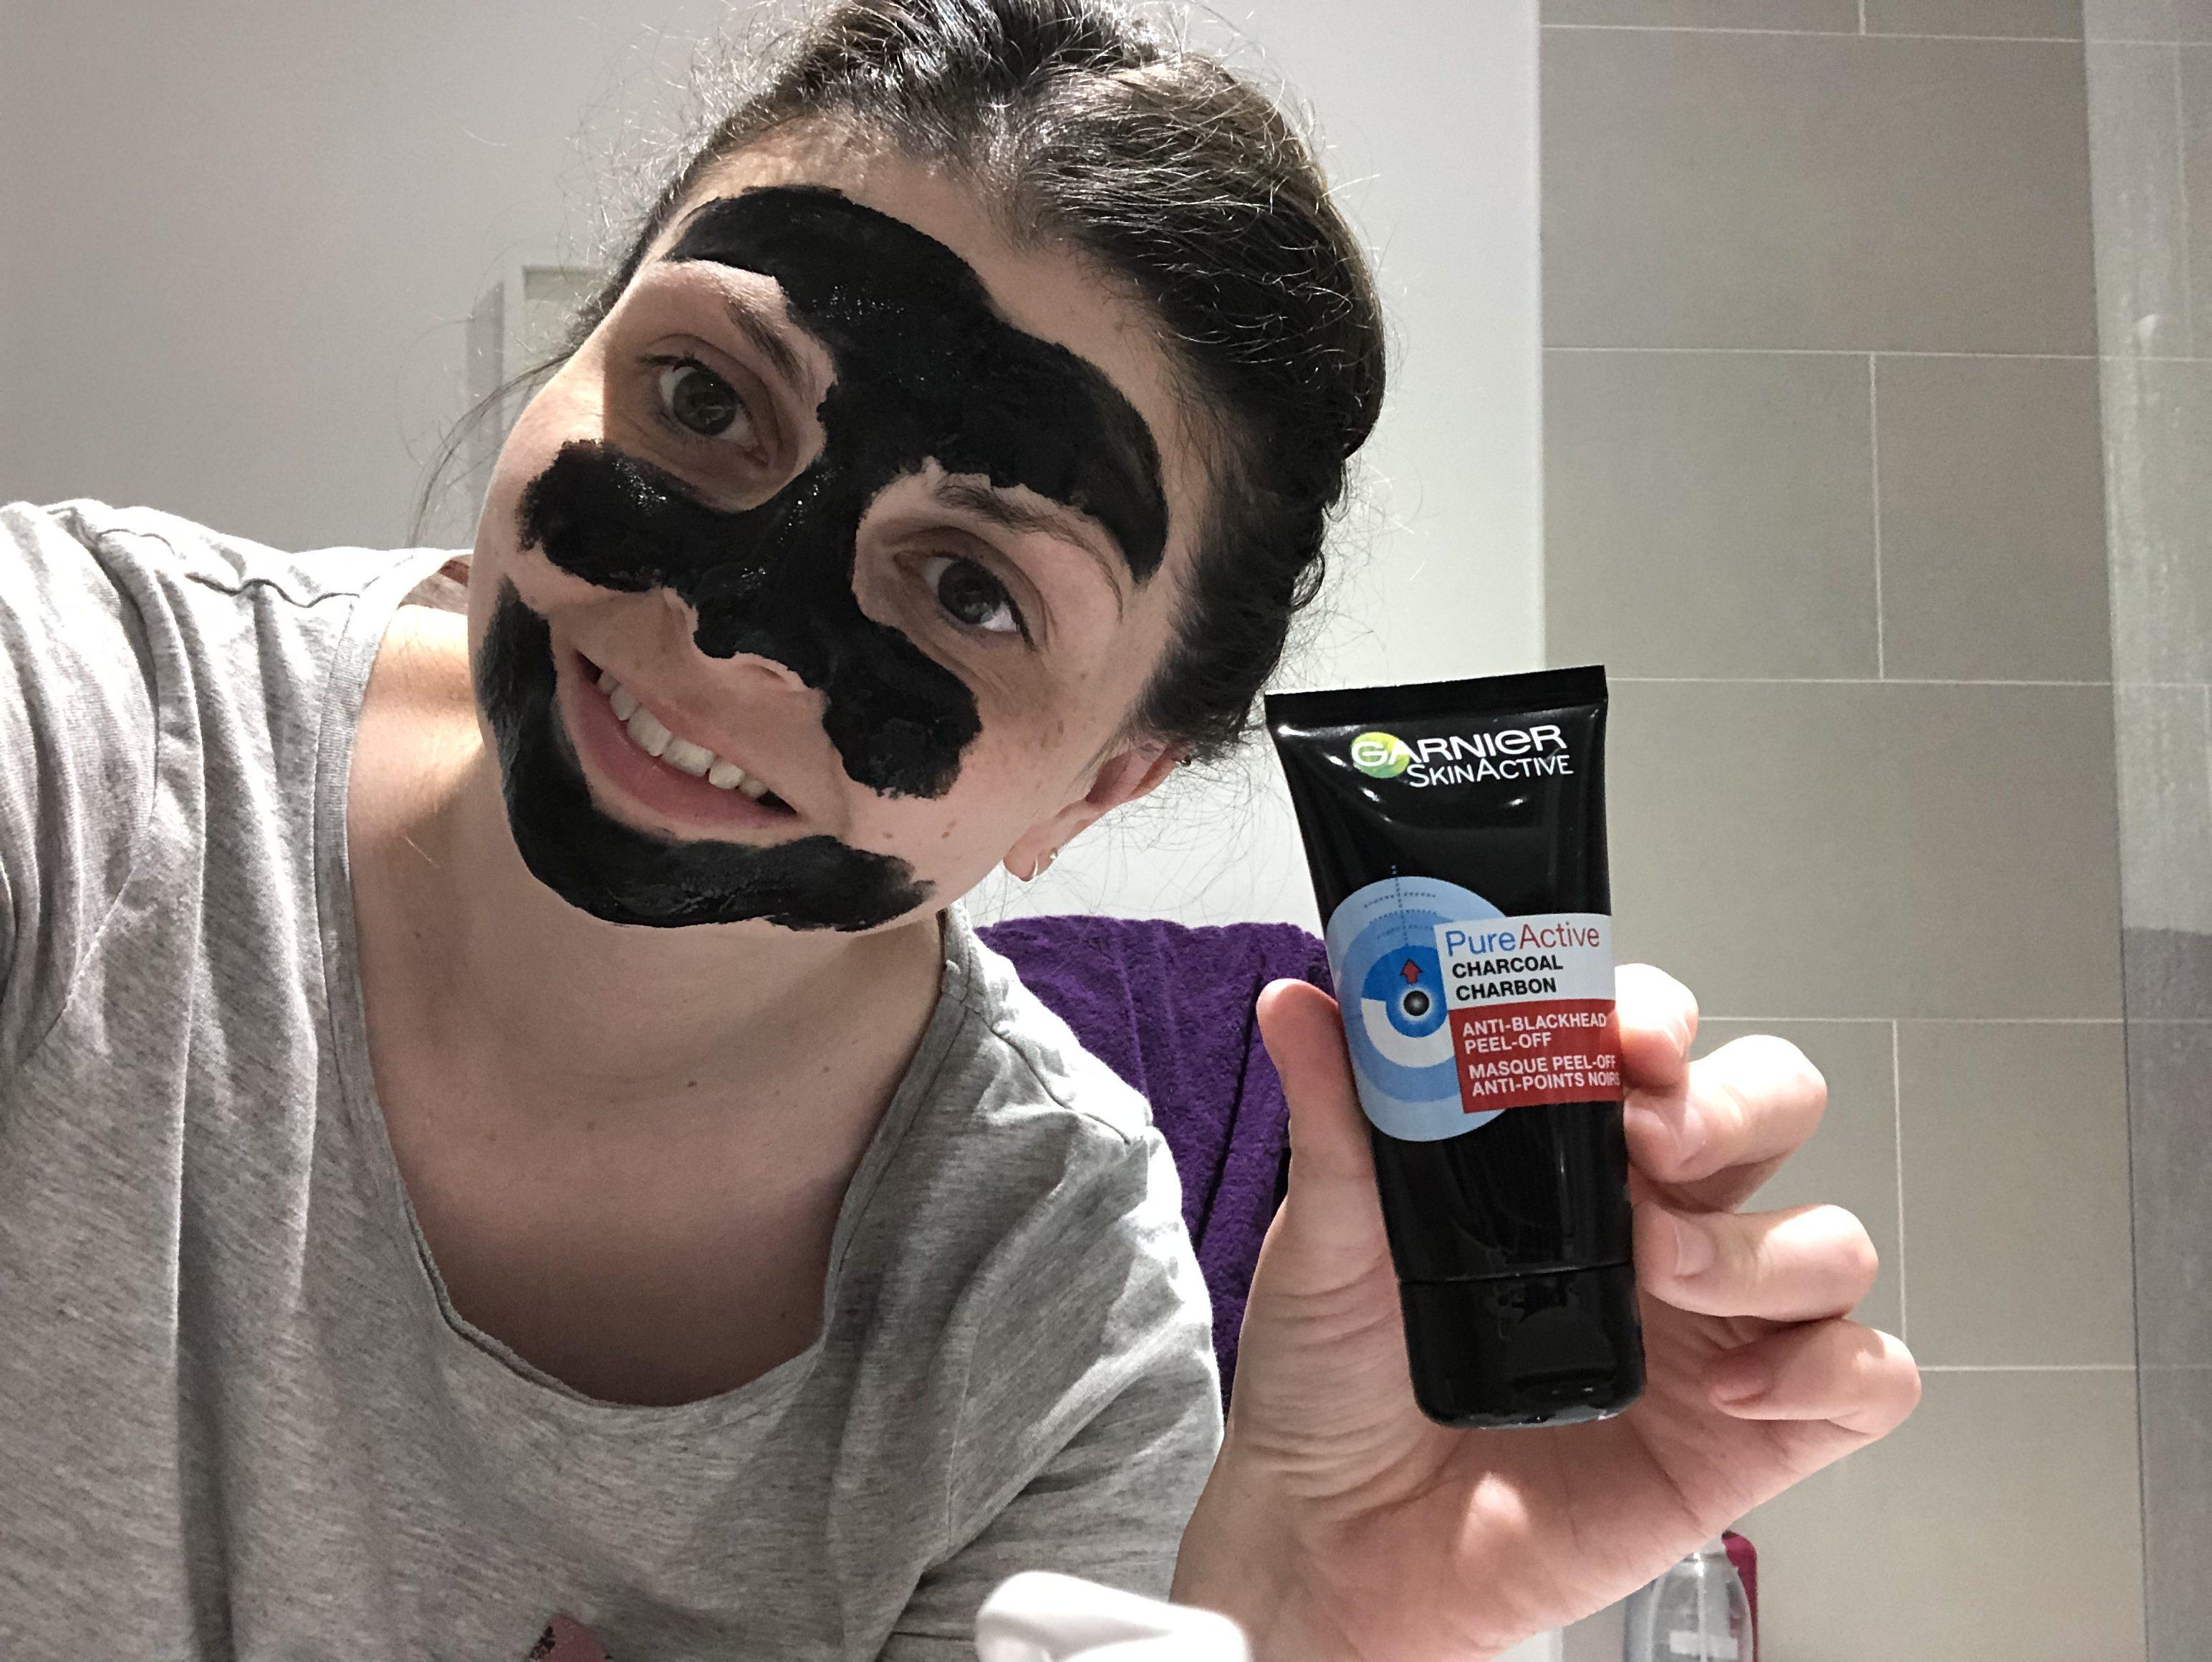 Garnier SkinActive Pure Active Charcoal Anti Blackhead Peel-Off Mask Review graphic